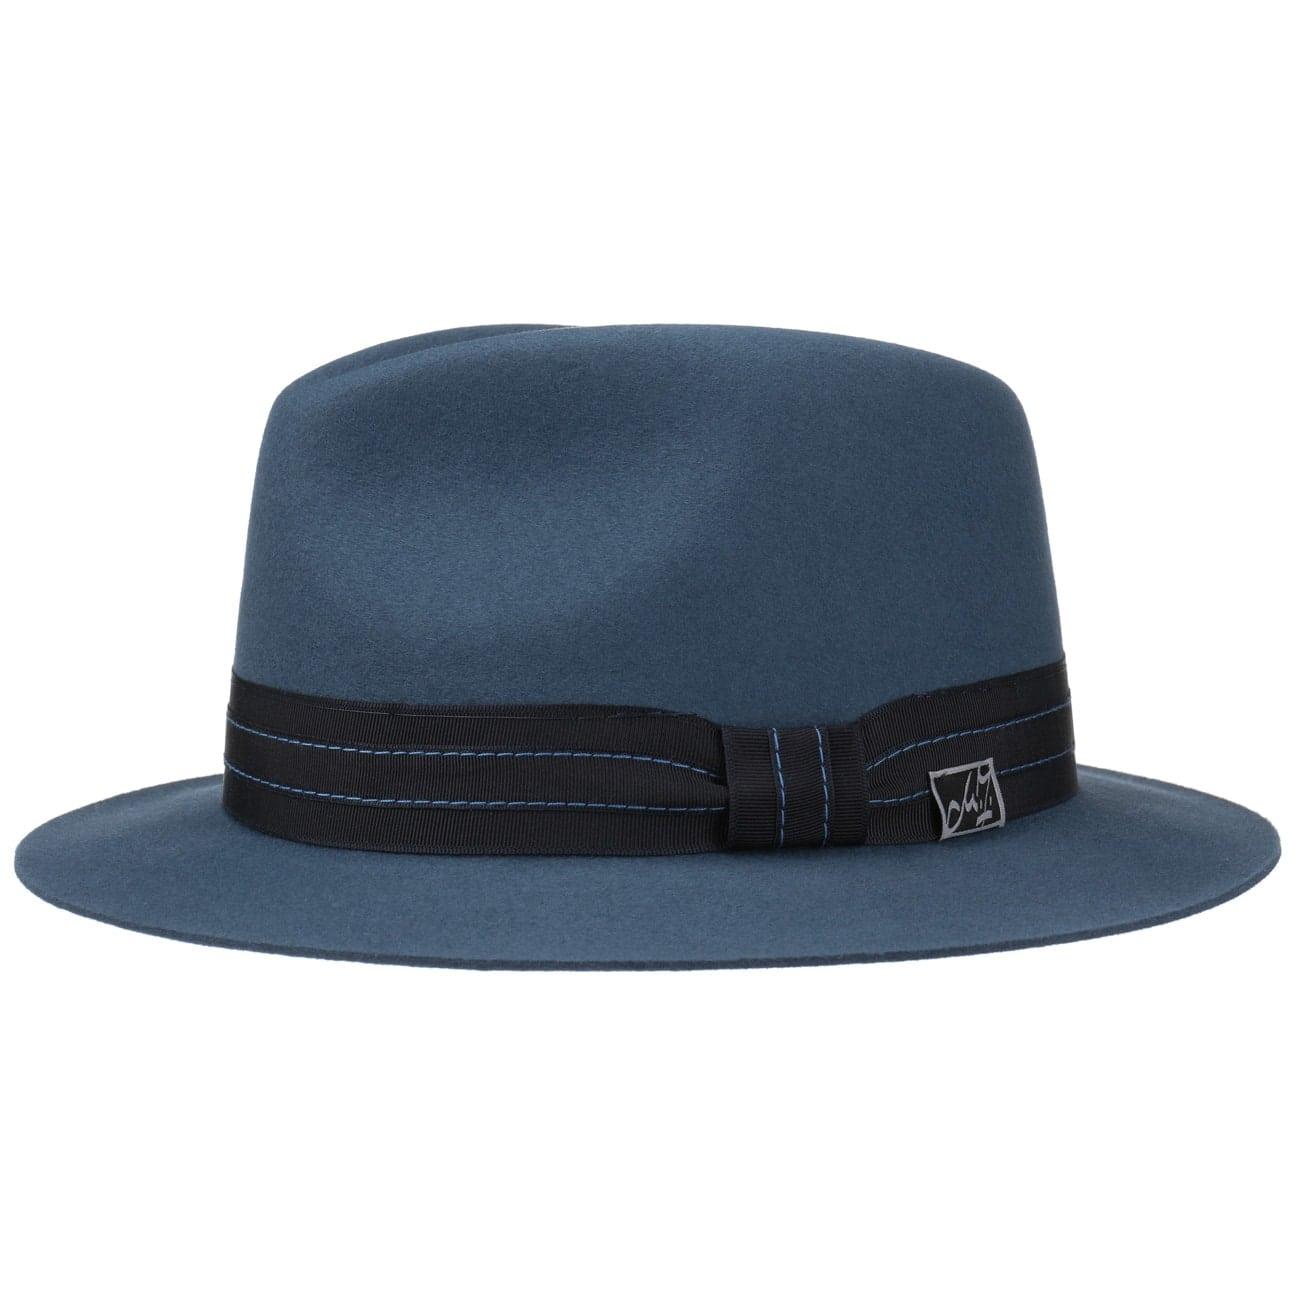 Sombrero de Fieltro Alisar by Michael Zechbauer  sombrero de fieltro